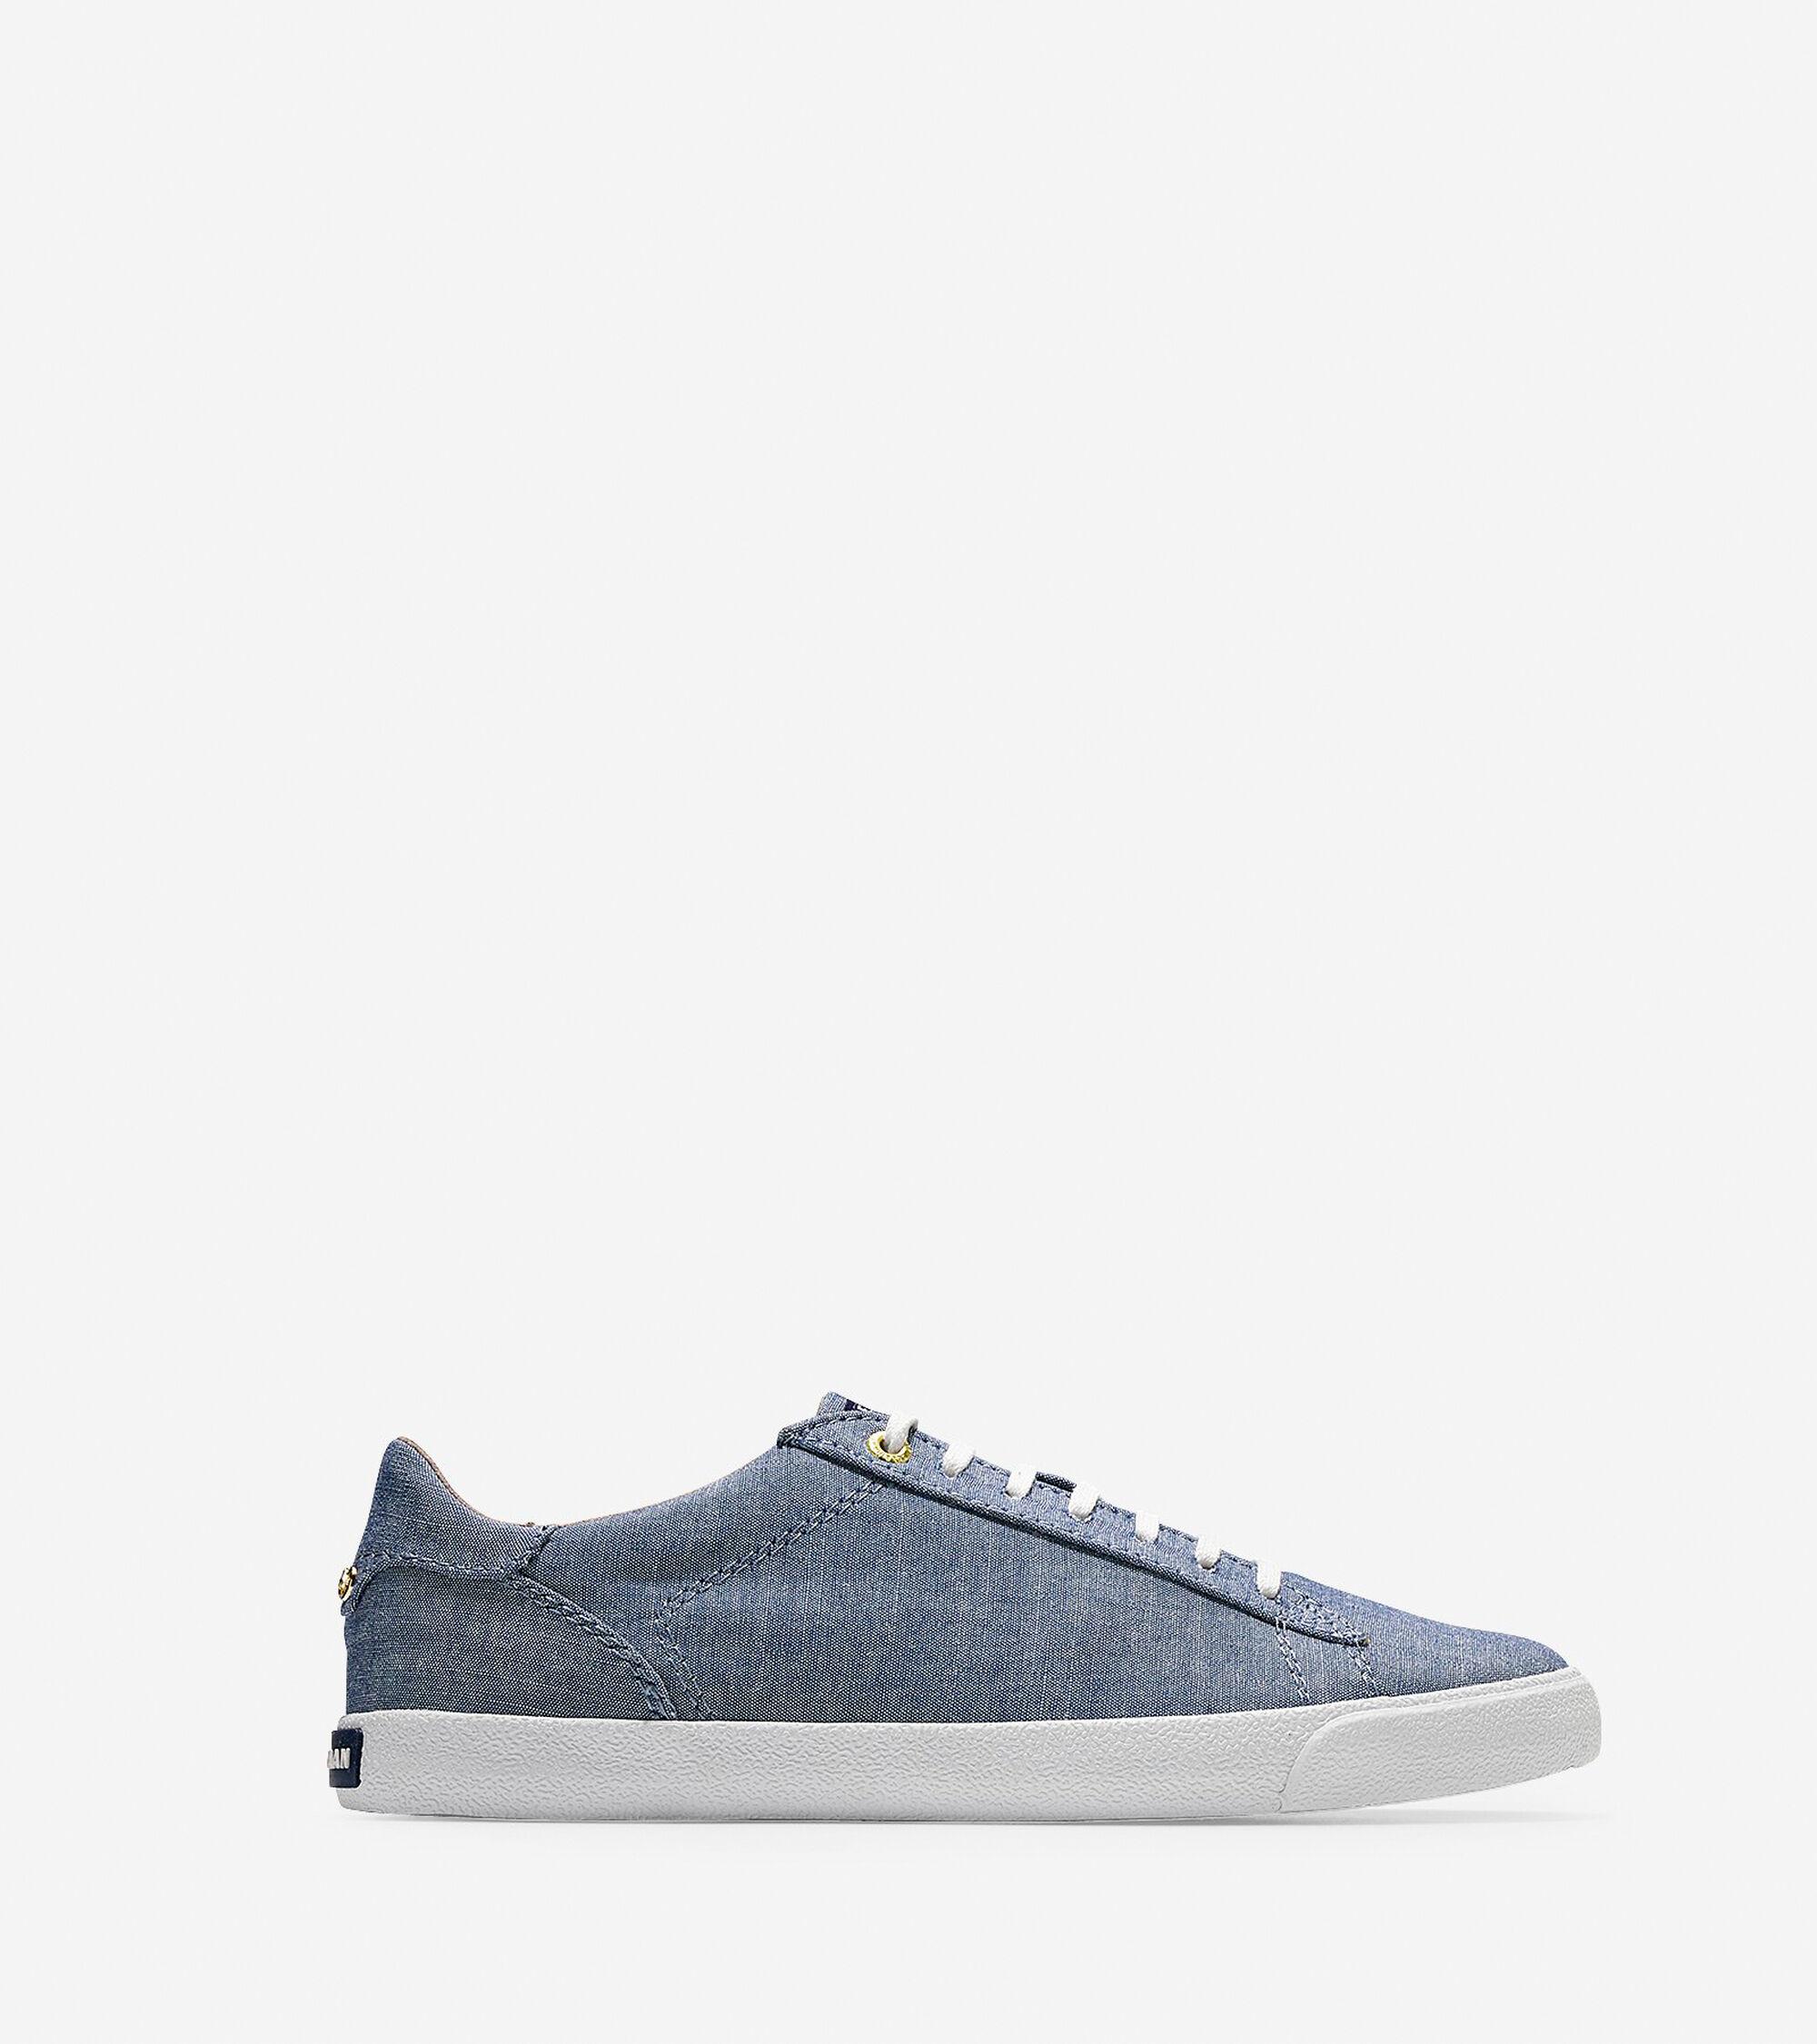 Sneakers > Trafton Club Court Sneaker